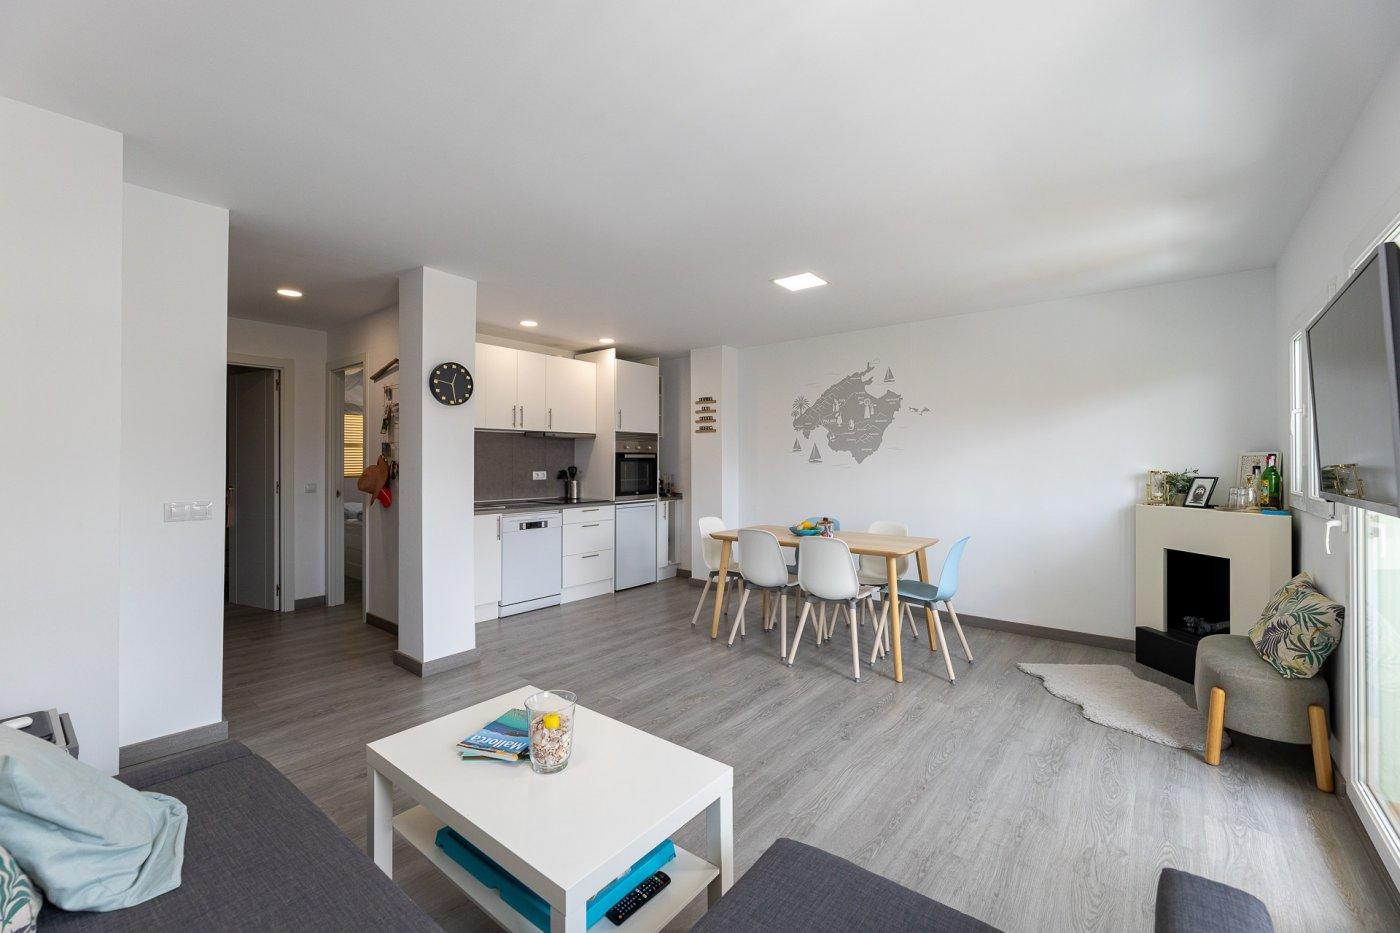 Acogedor piso en zona foners, palma - imagenInmueble6